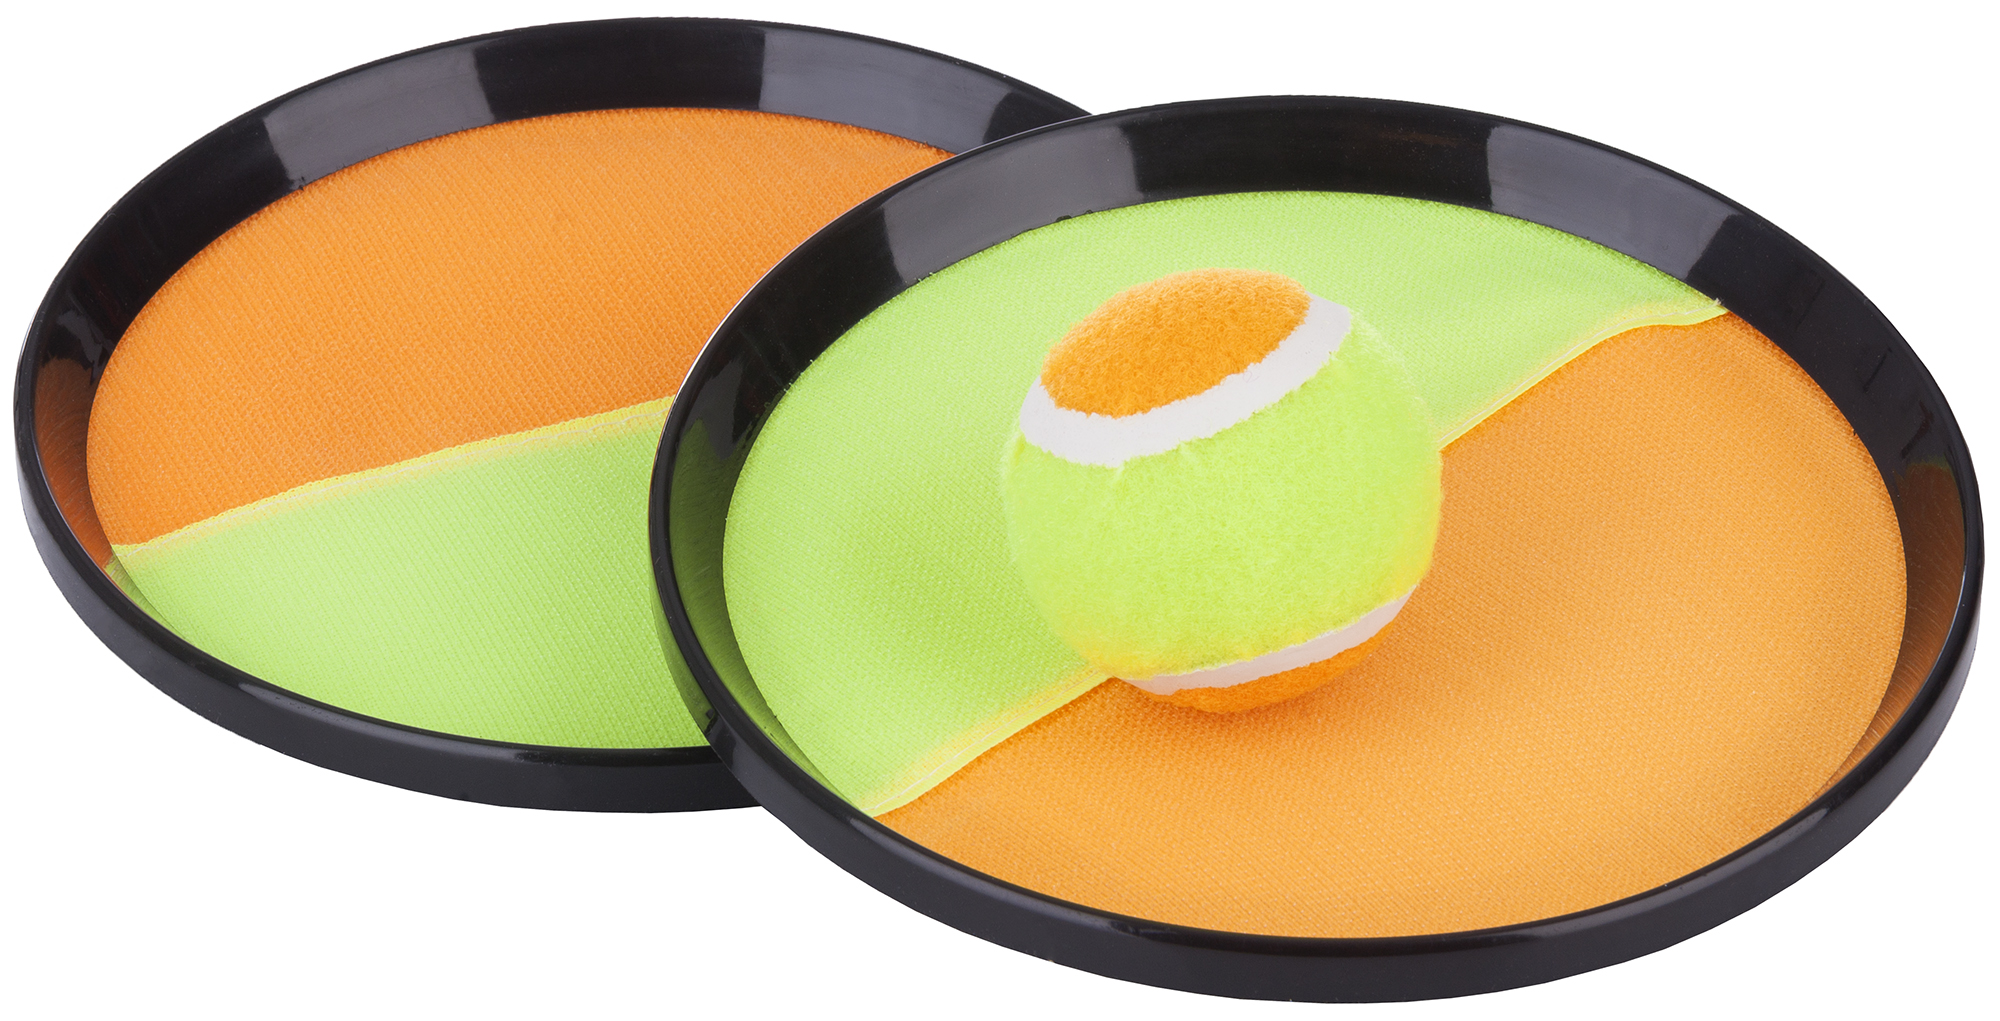 Torneo Набор с тарелками-ловушками и мячиком Torneo Magic Catchball набор воланов для спидминтона torneo torneo